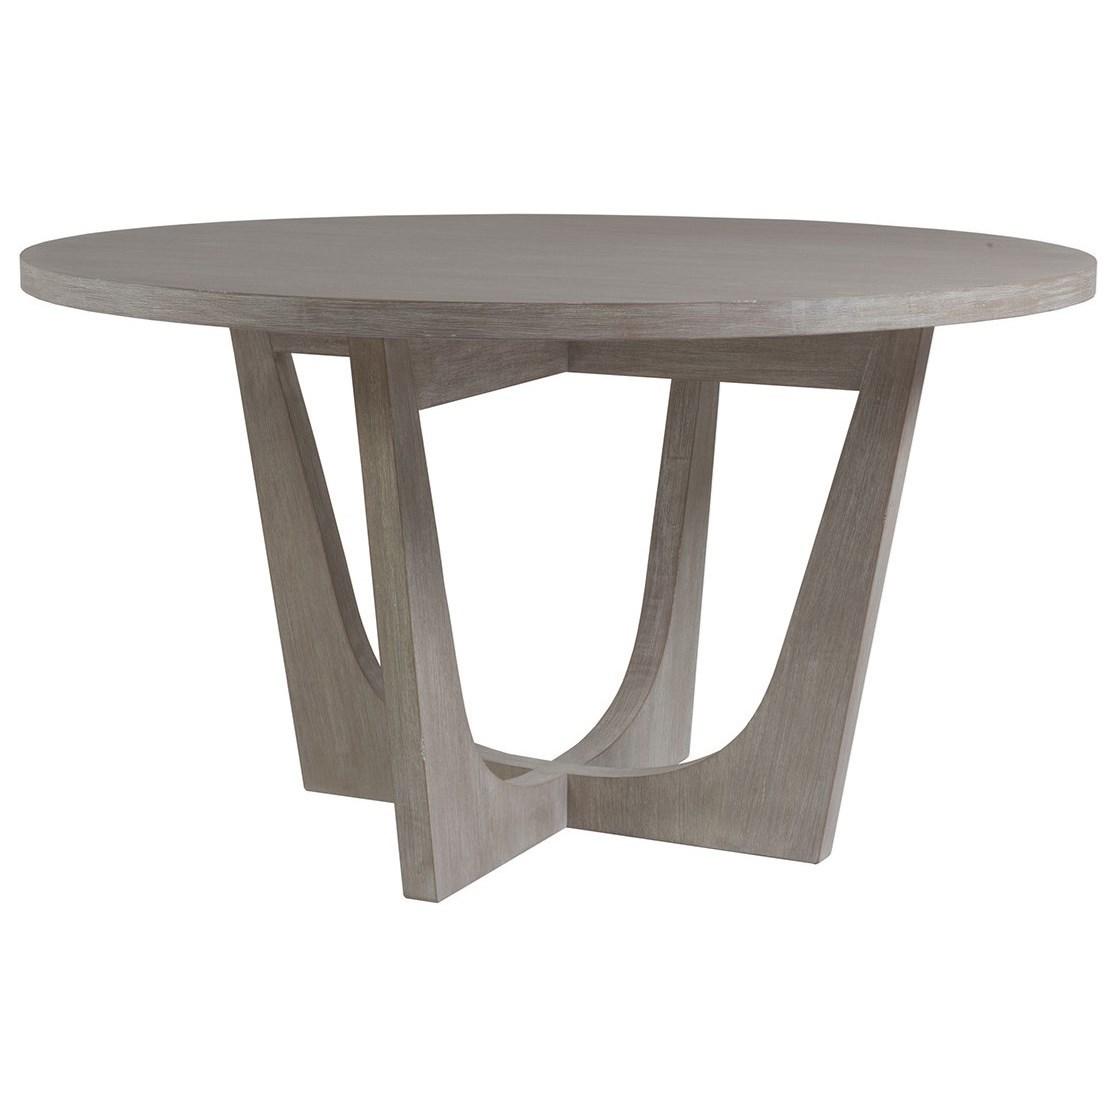 Artistica Cohesion Brio Round Dining Table - Item Number: 2058-870-40